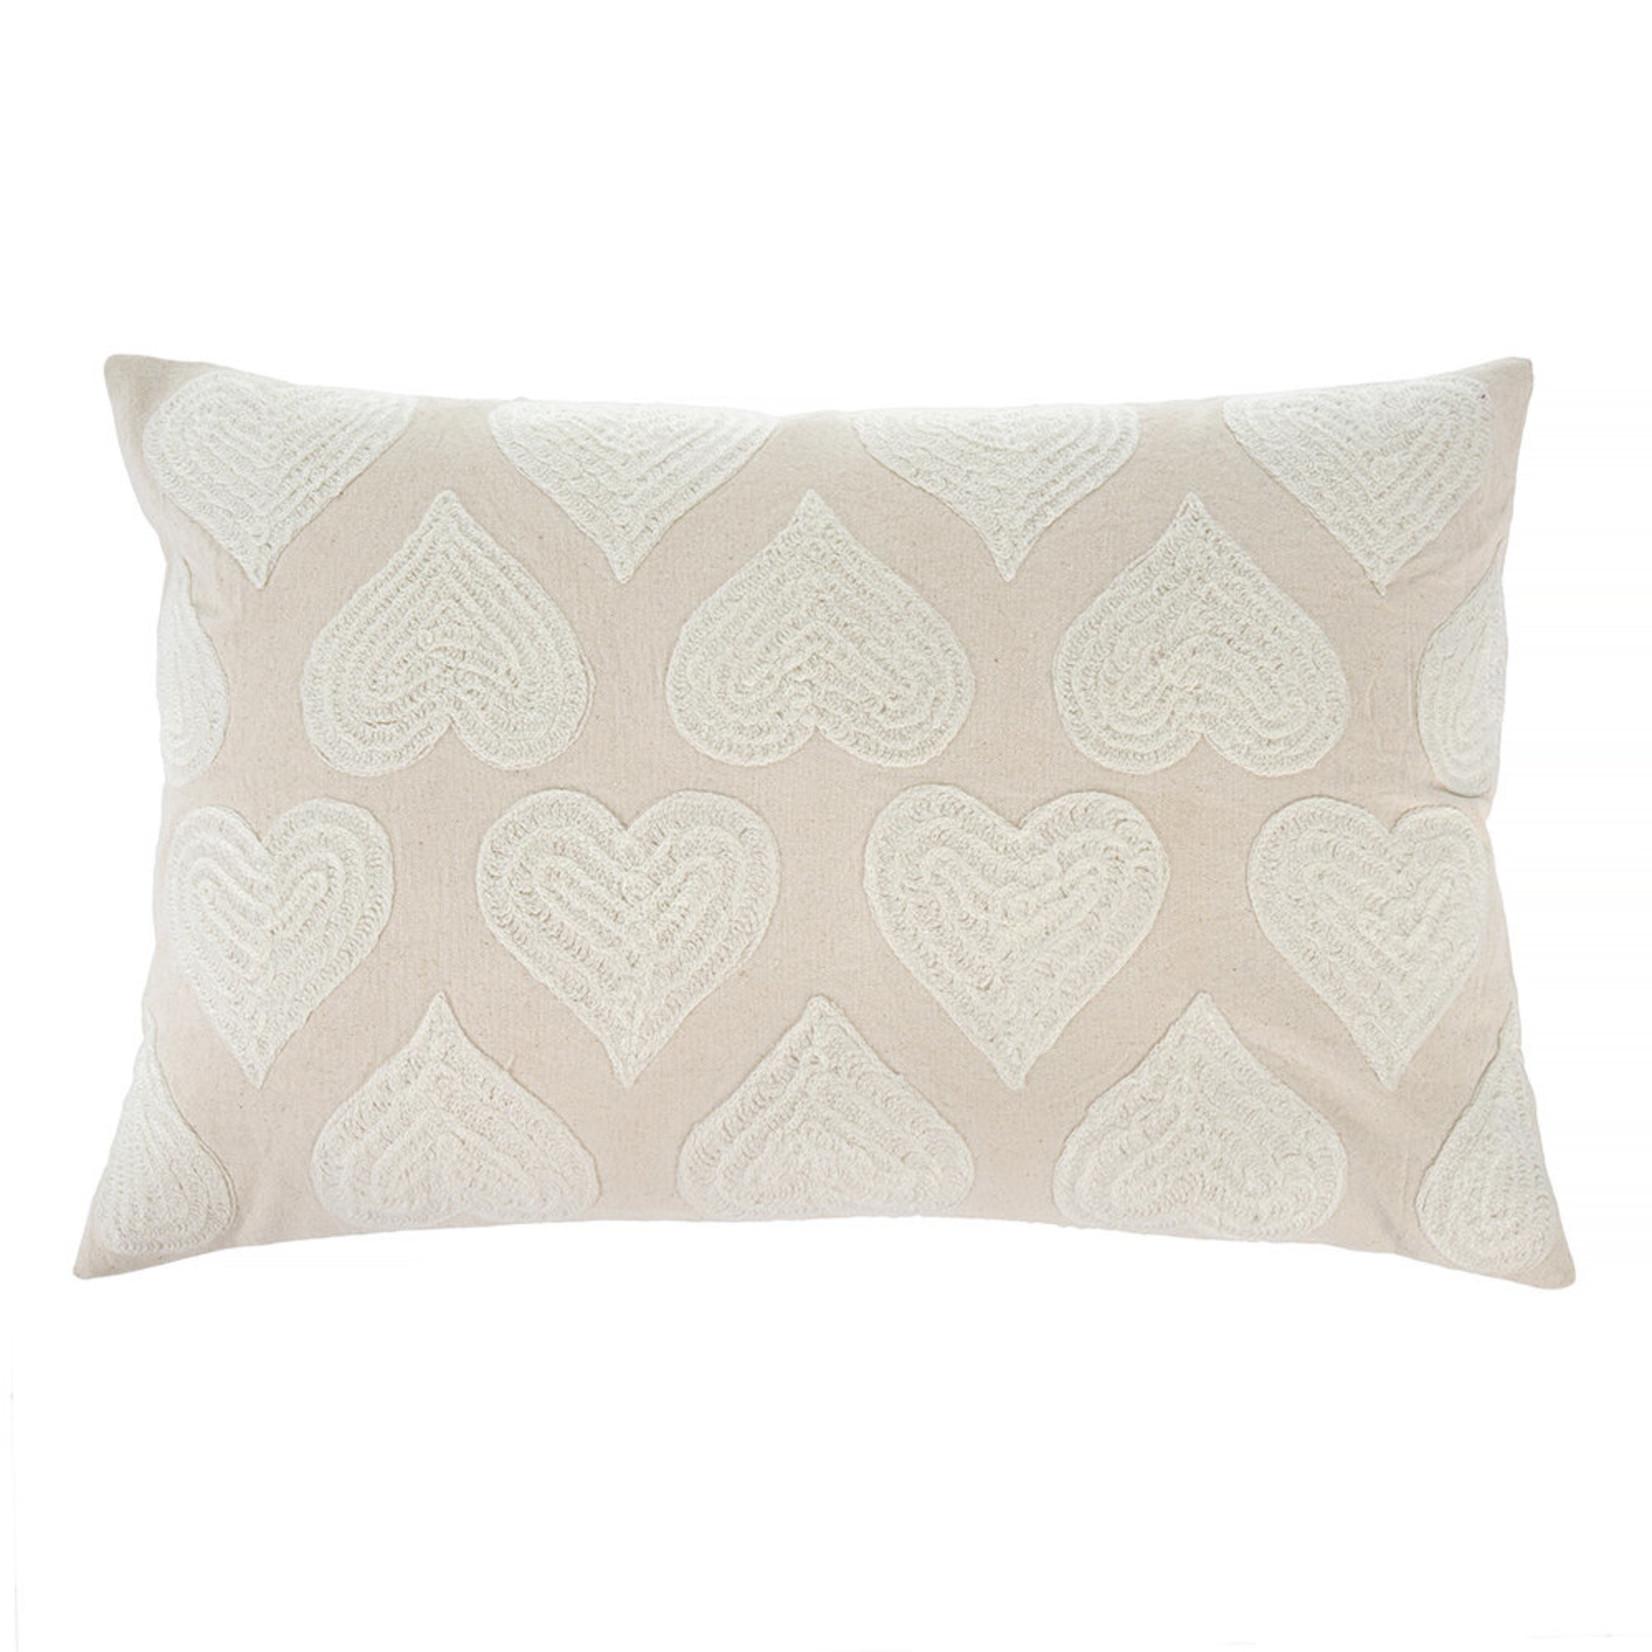 Indaba Heartbeat Pillow - White